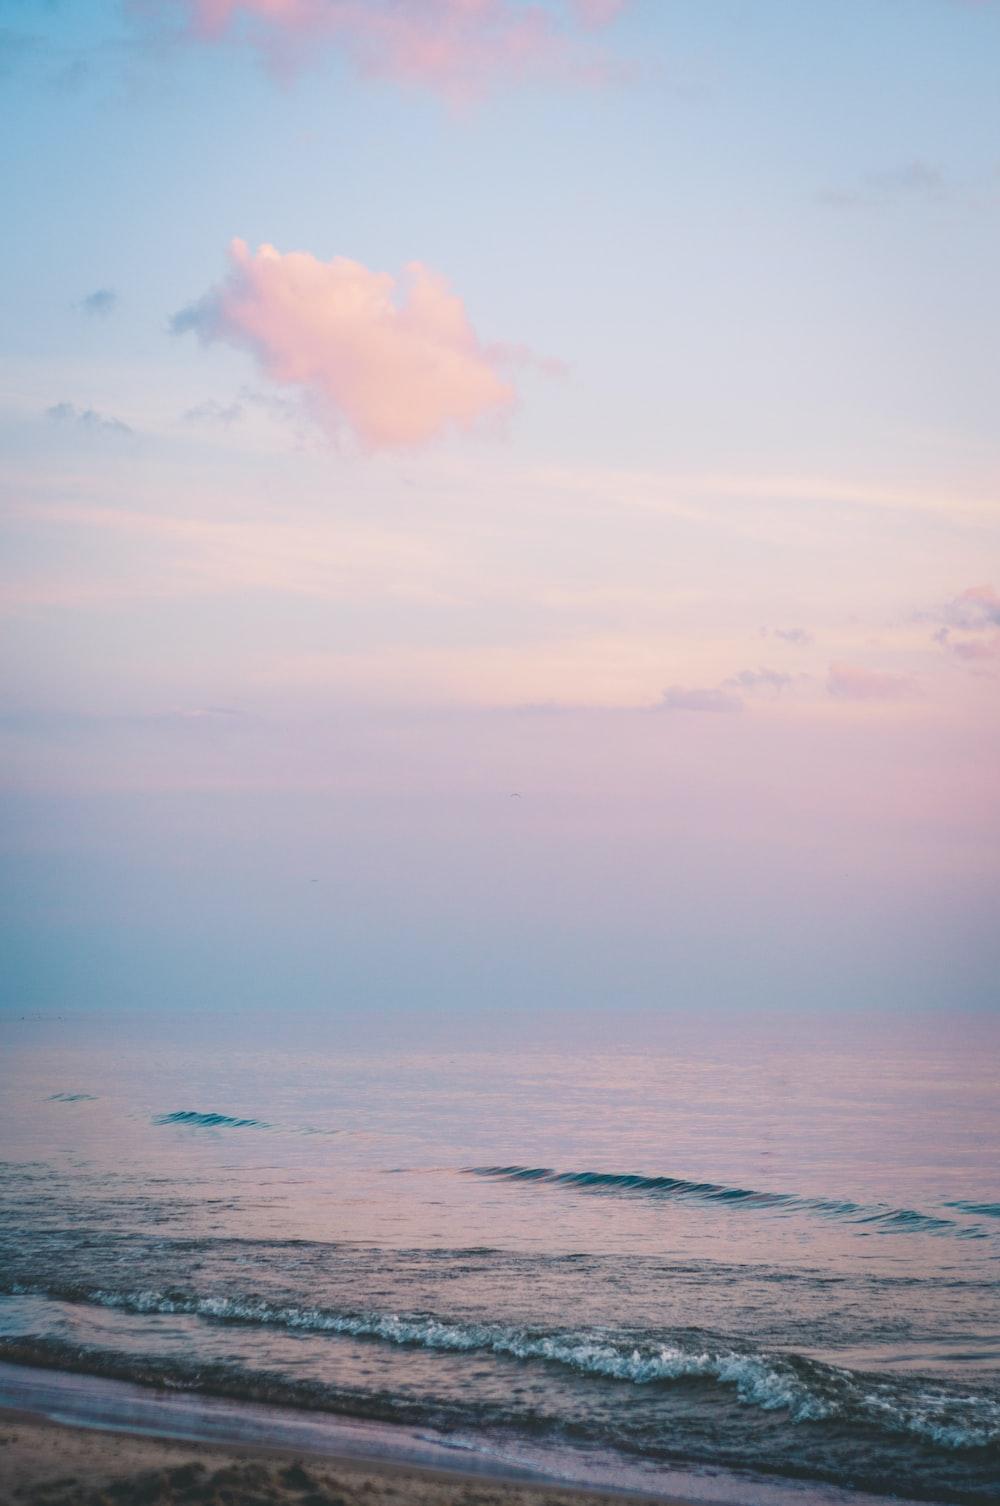 ocean under cloudy sky